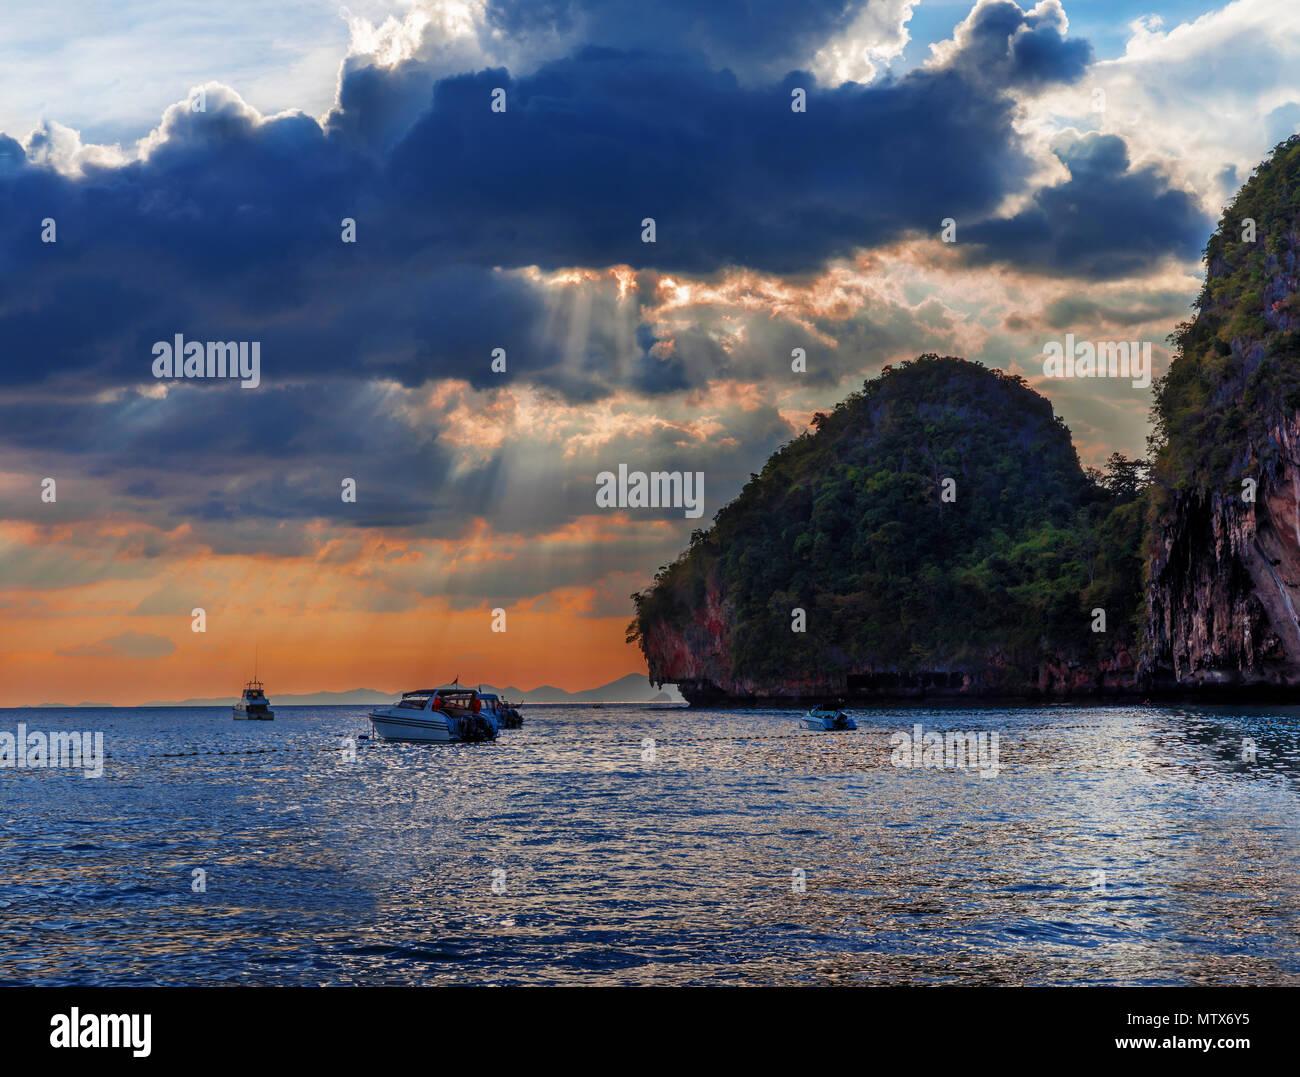 Popular travel tropical karst rocks perfect for climbing Phra Nang Cave Beach in sunset, Krabi province, Thailand Stock Photo